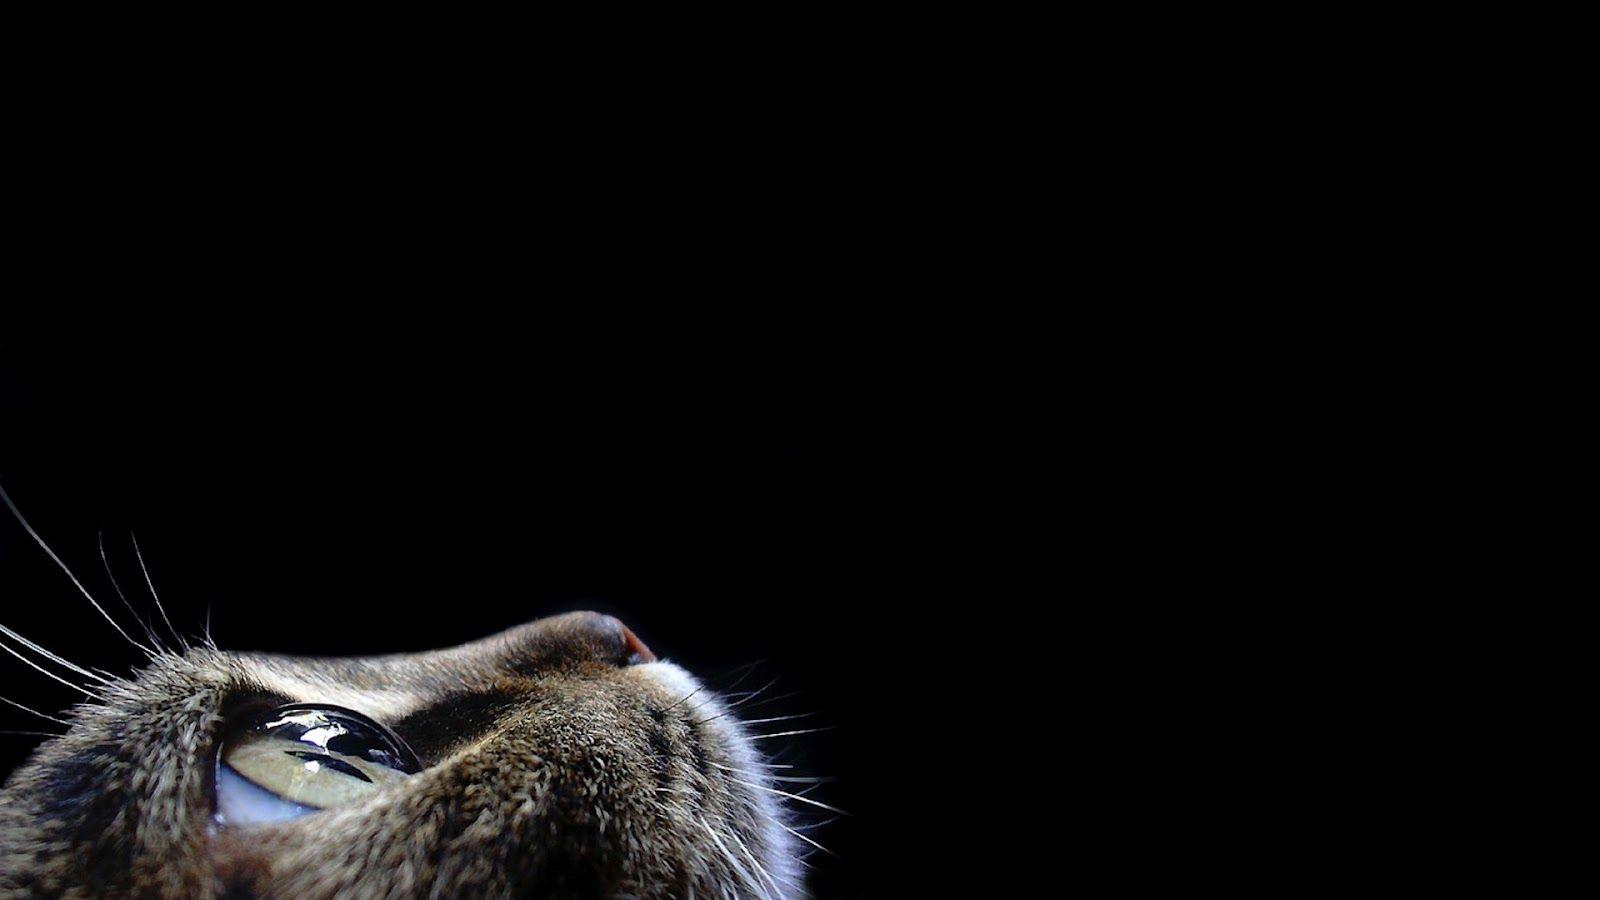 Black Cat Face Desktop Wallpaper